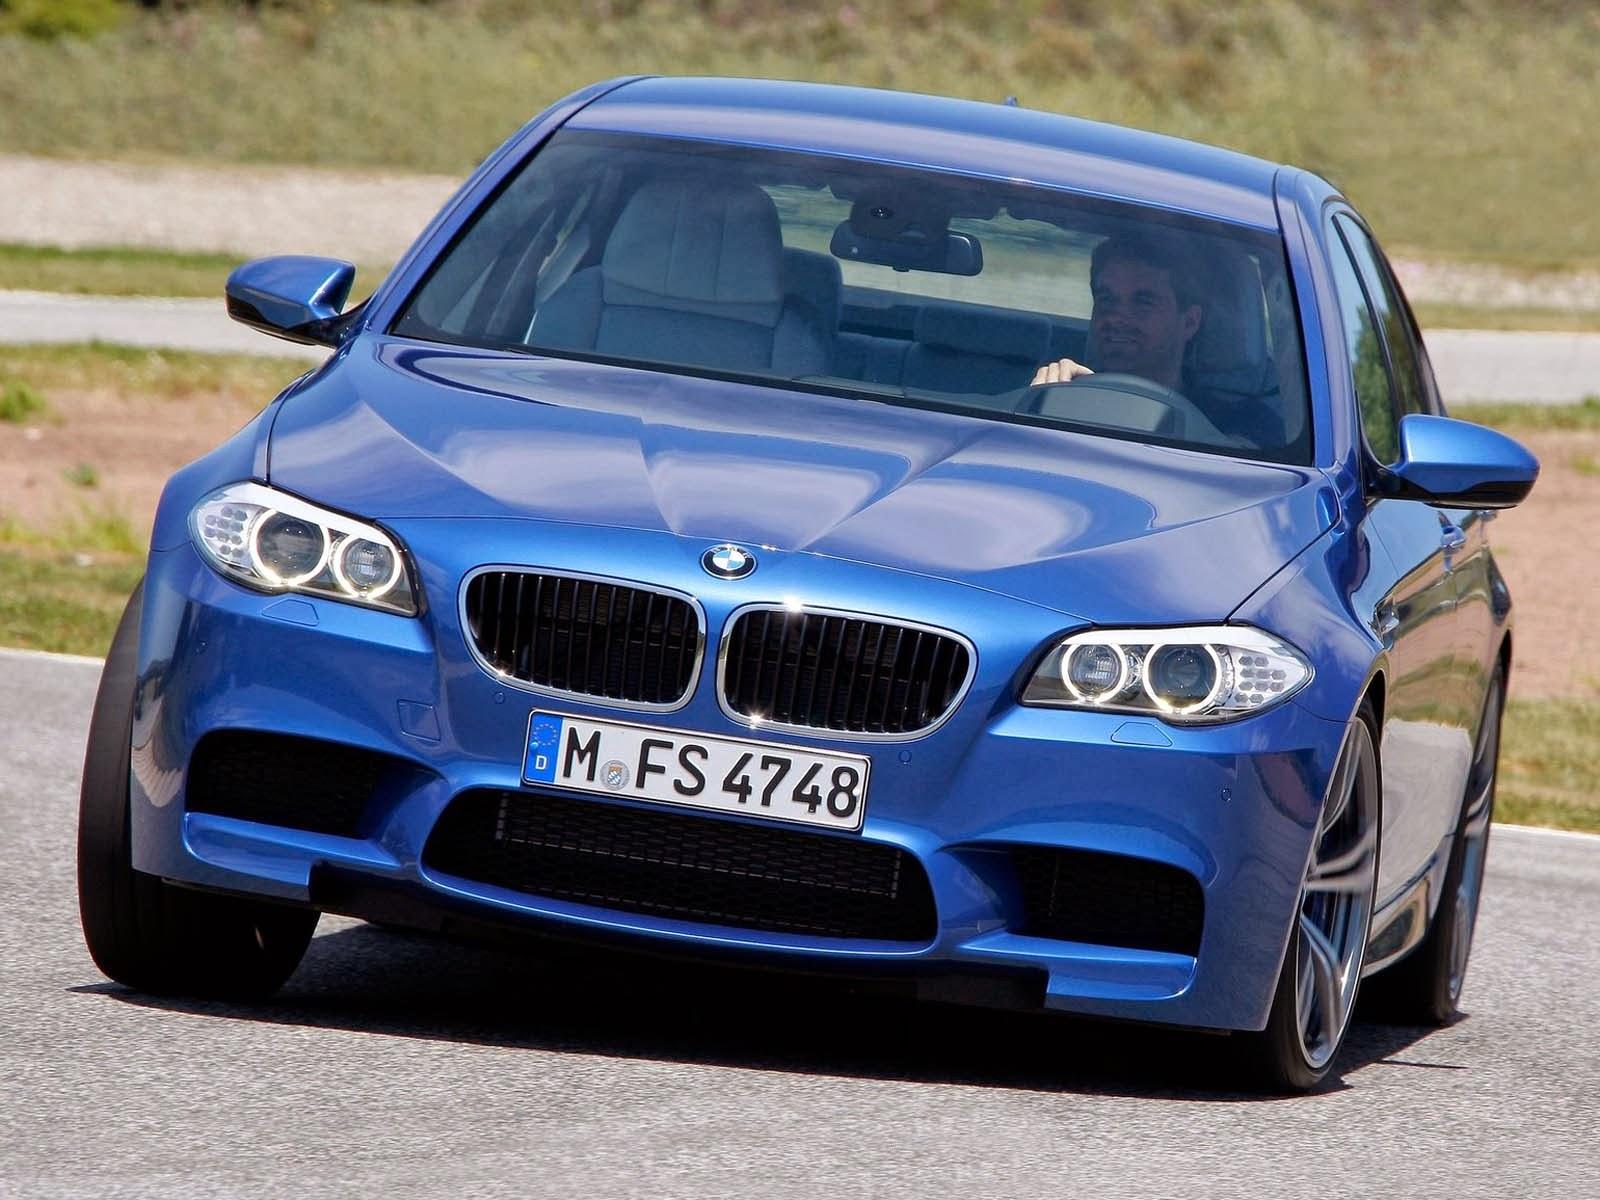 BMW M5 Desktop Wallpapers 2014 | Welcome Cars